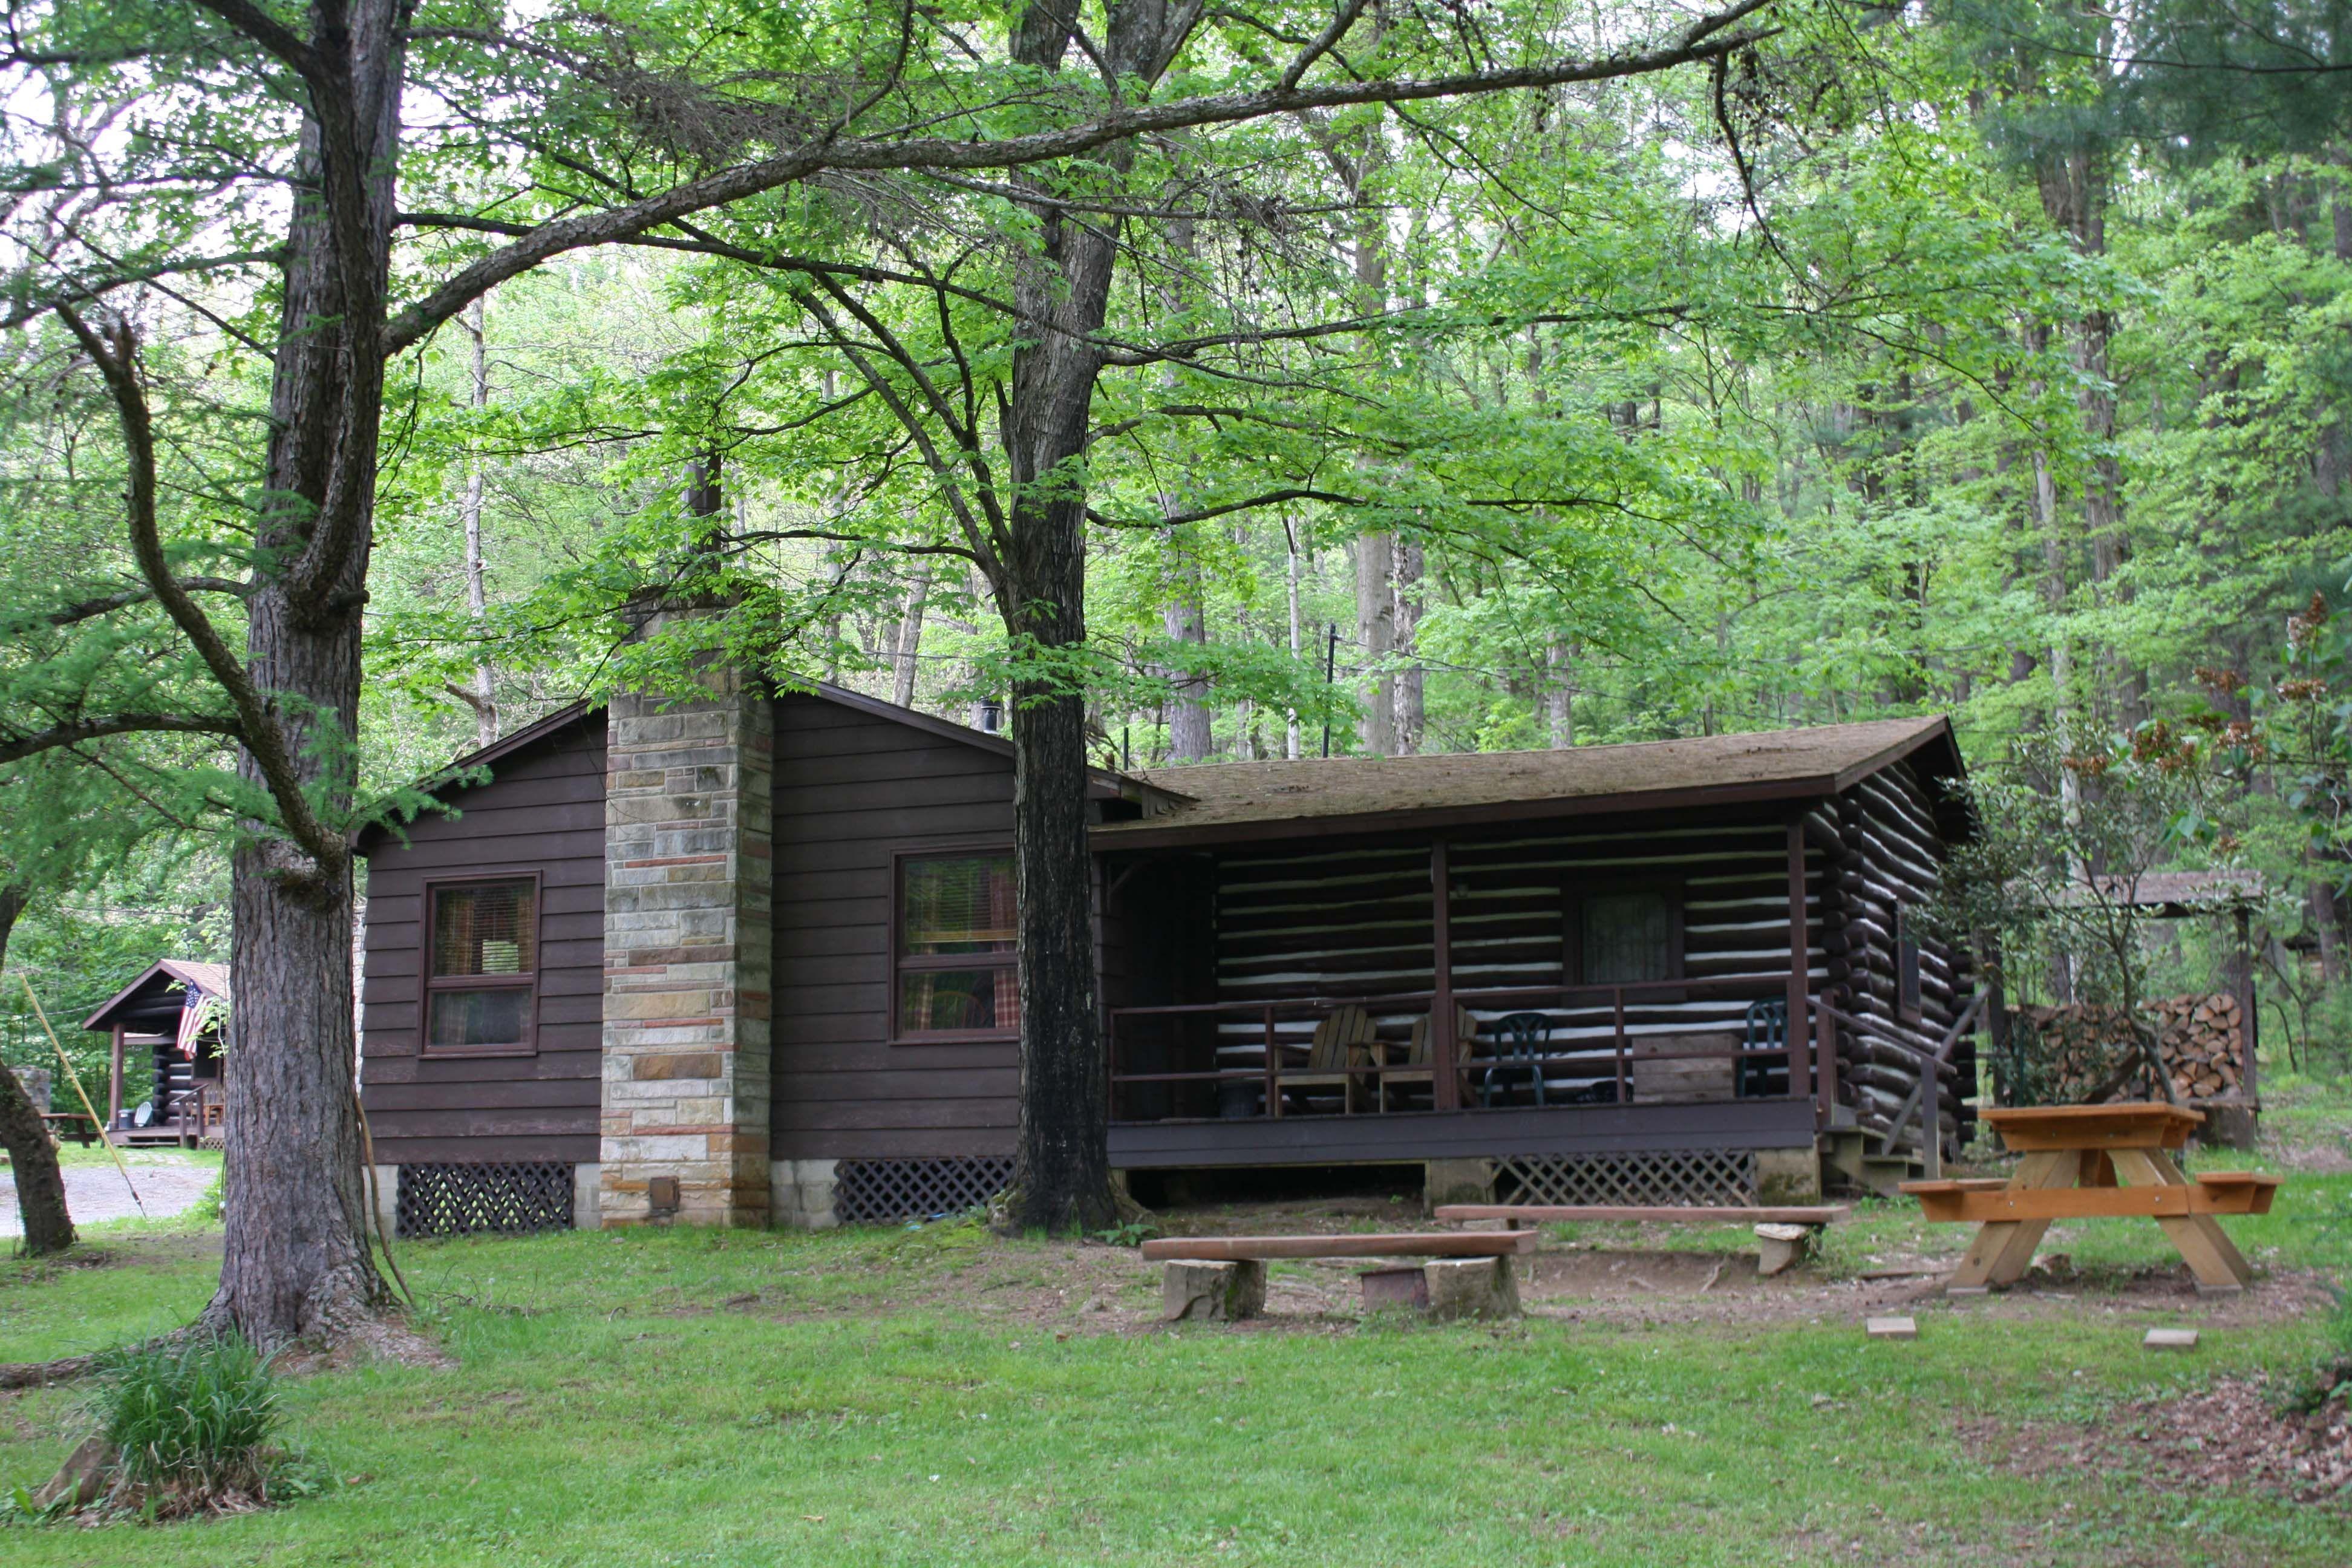 Cook Forest Summer Cabins Summer Cabins Cabin Rentals Forest Cabin